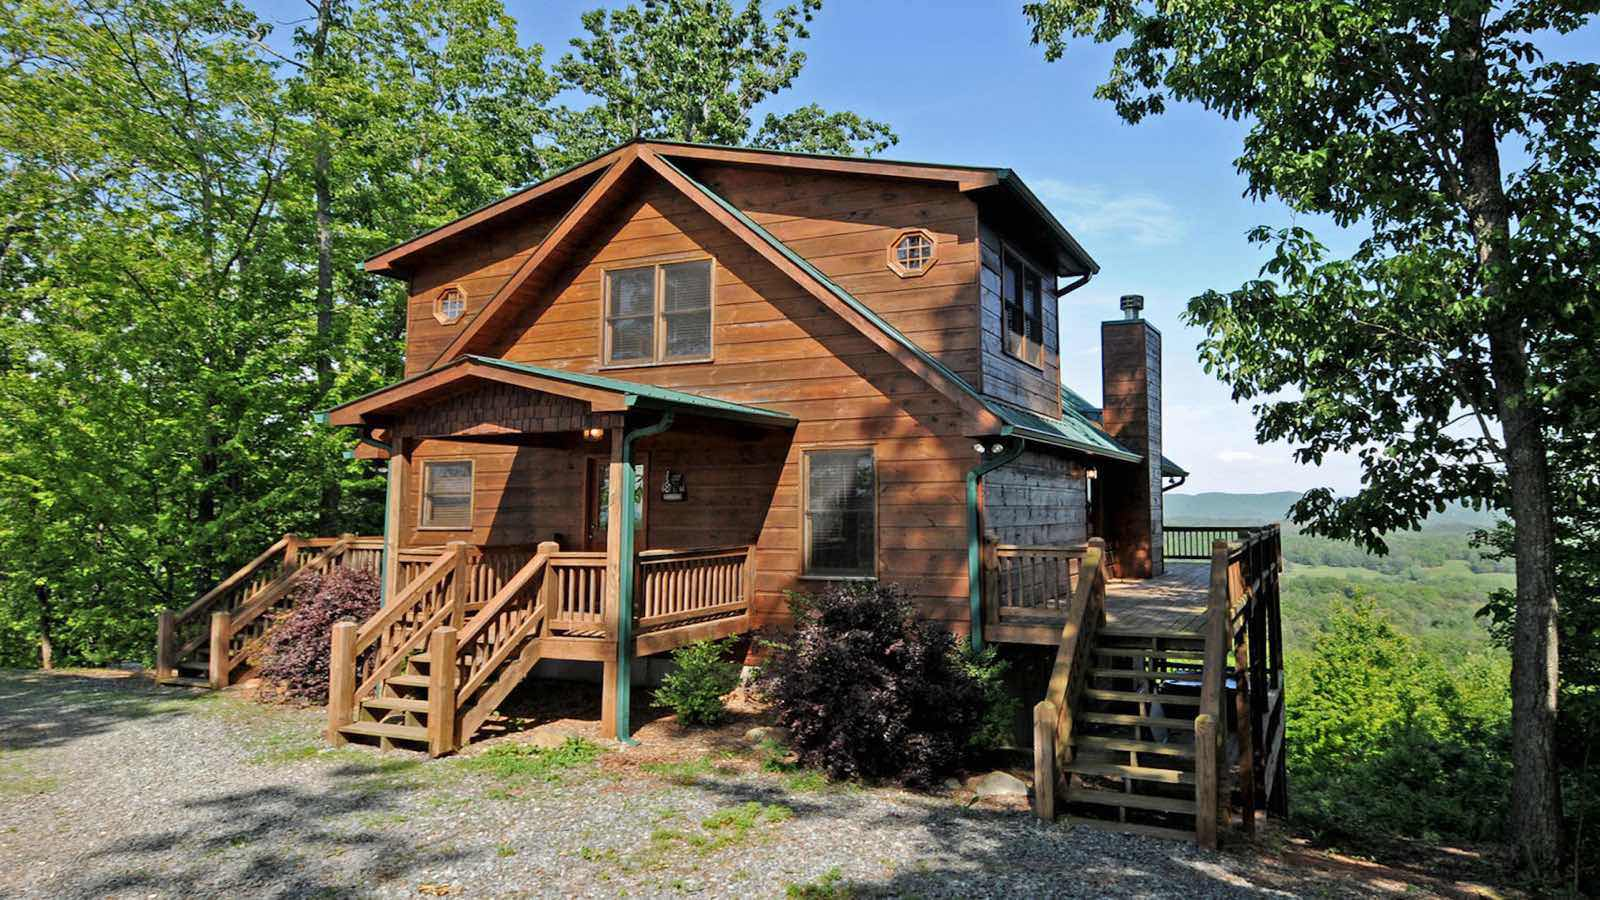 At sunrise ridge rental cabin blue ridge ga for Blue ridge ga cabins for rent